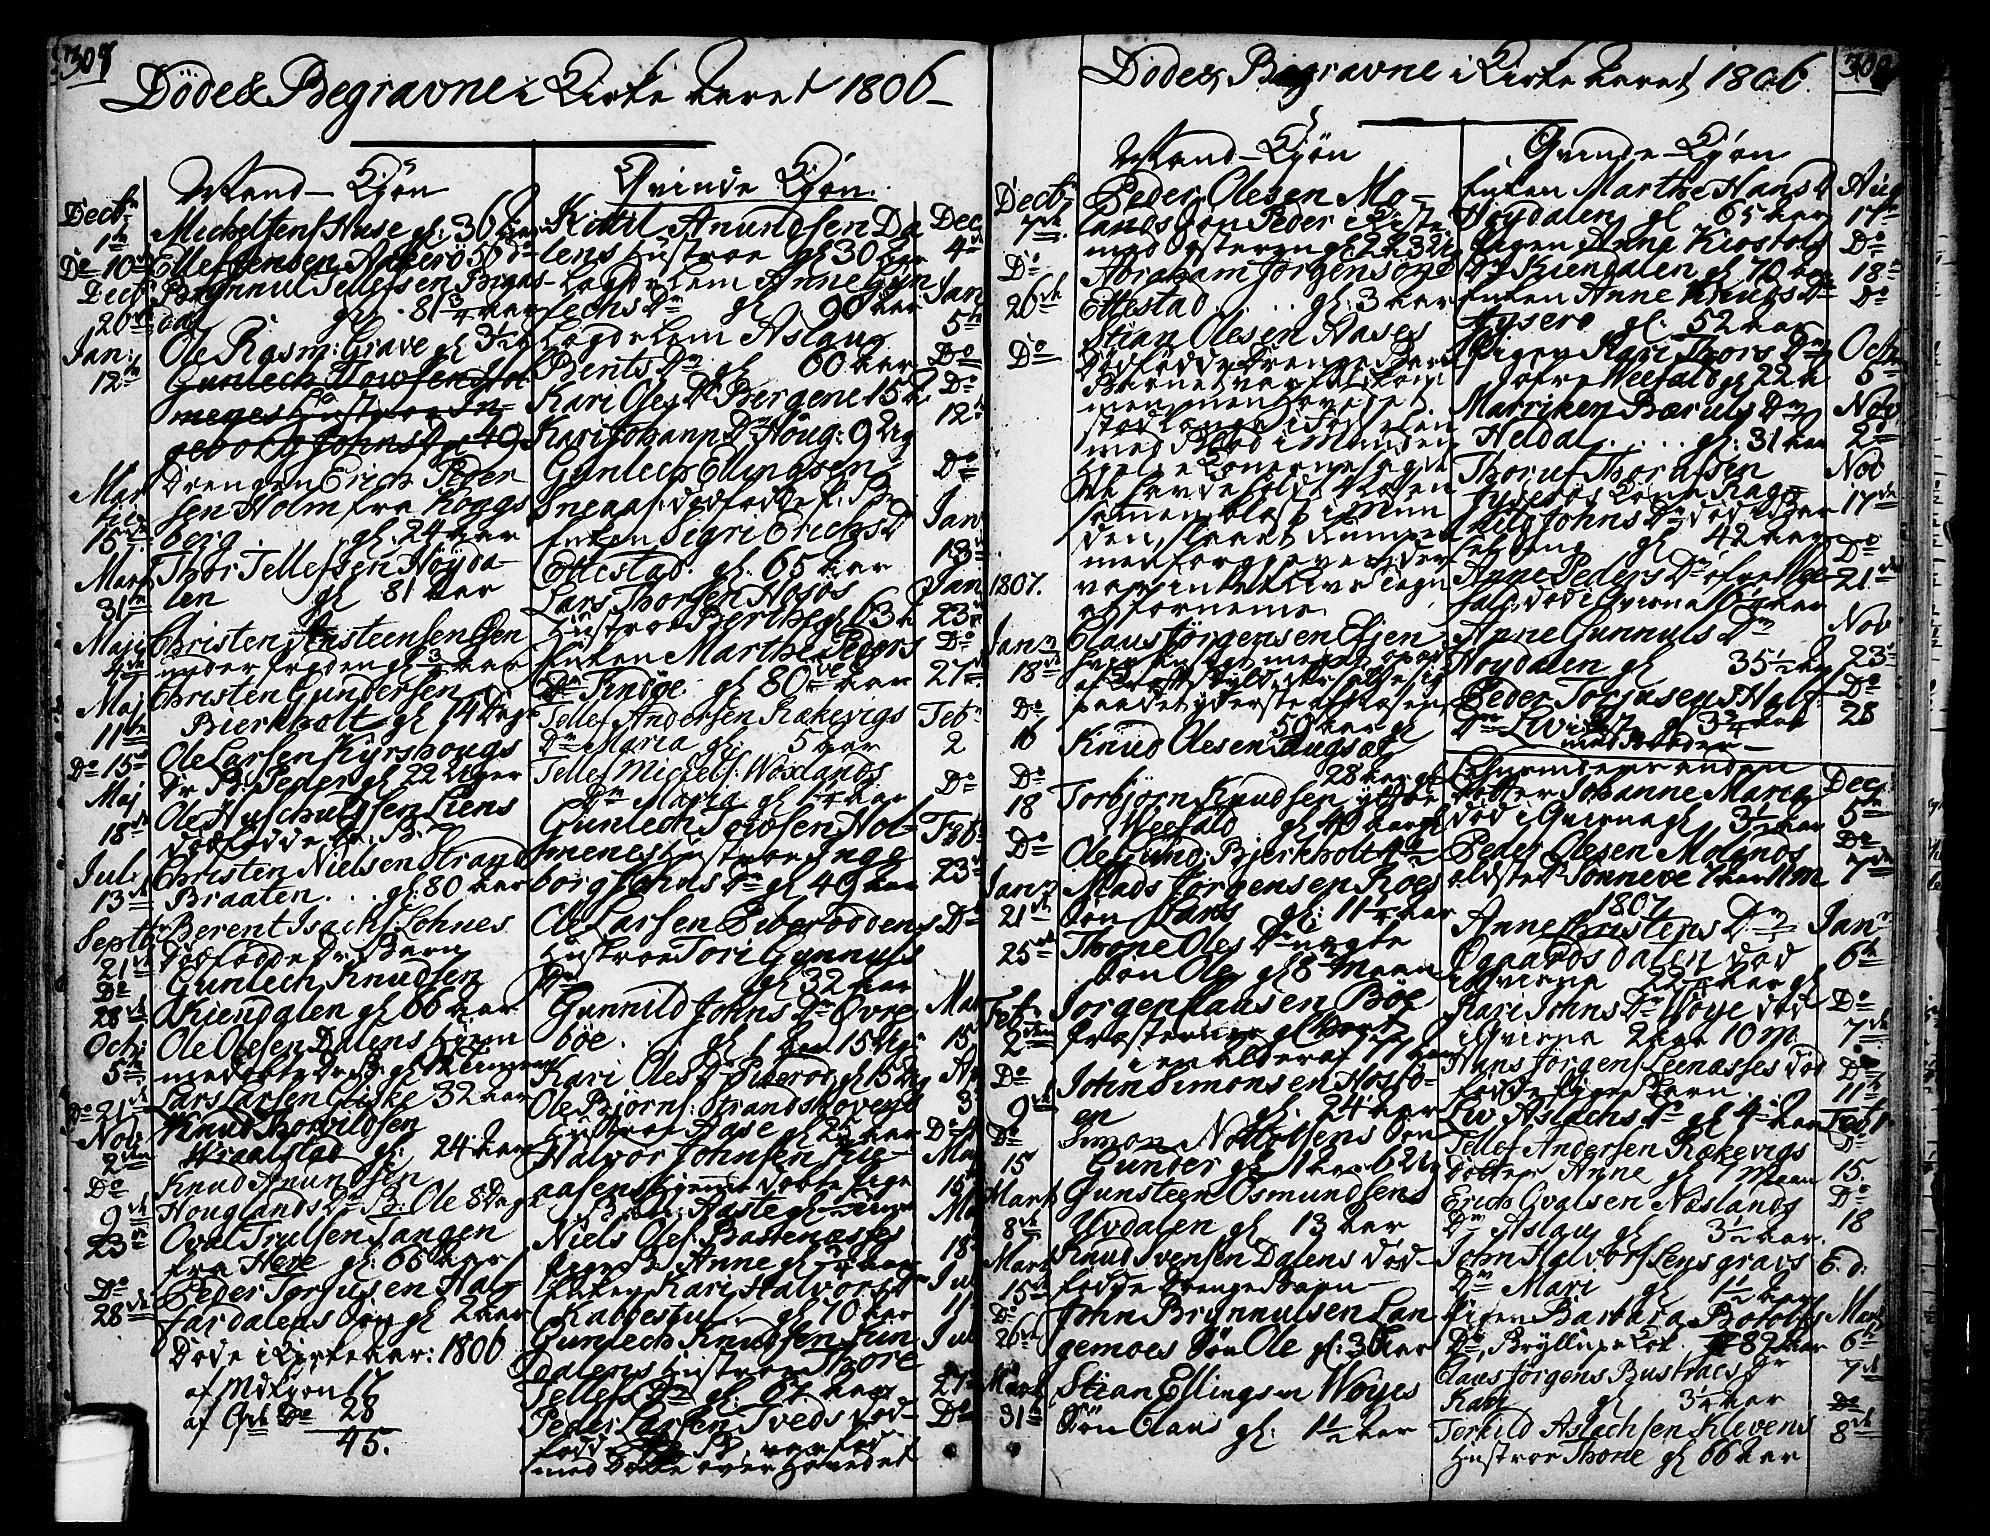 SAKO, Drangedal kirkebøker, F/Fa/L0003: Ministerialbok nr. 3, 1768-1814, s. 307-308